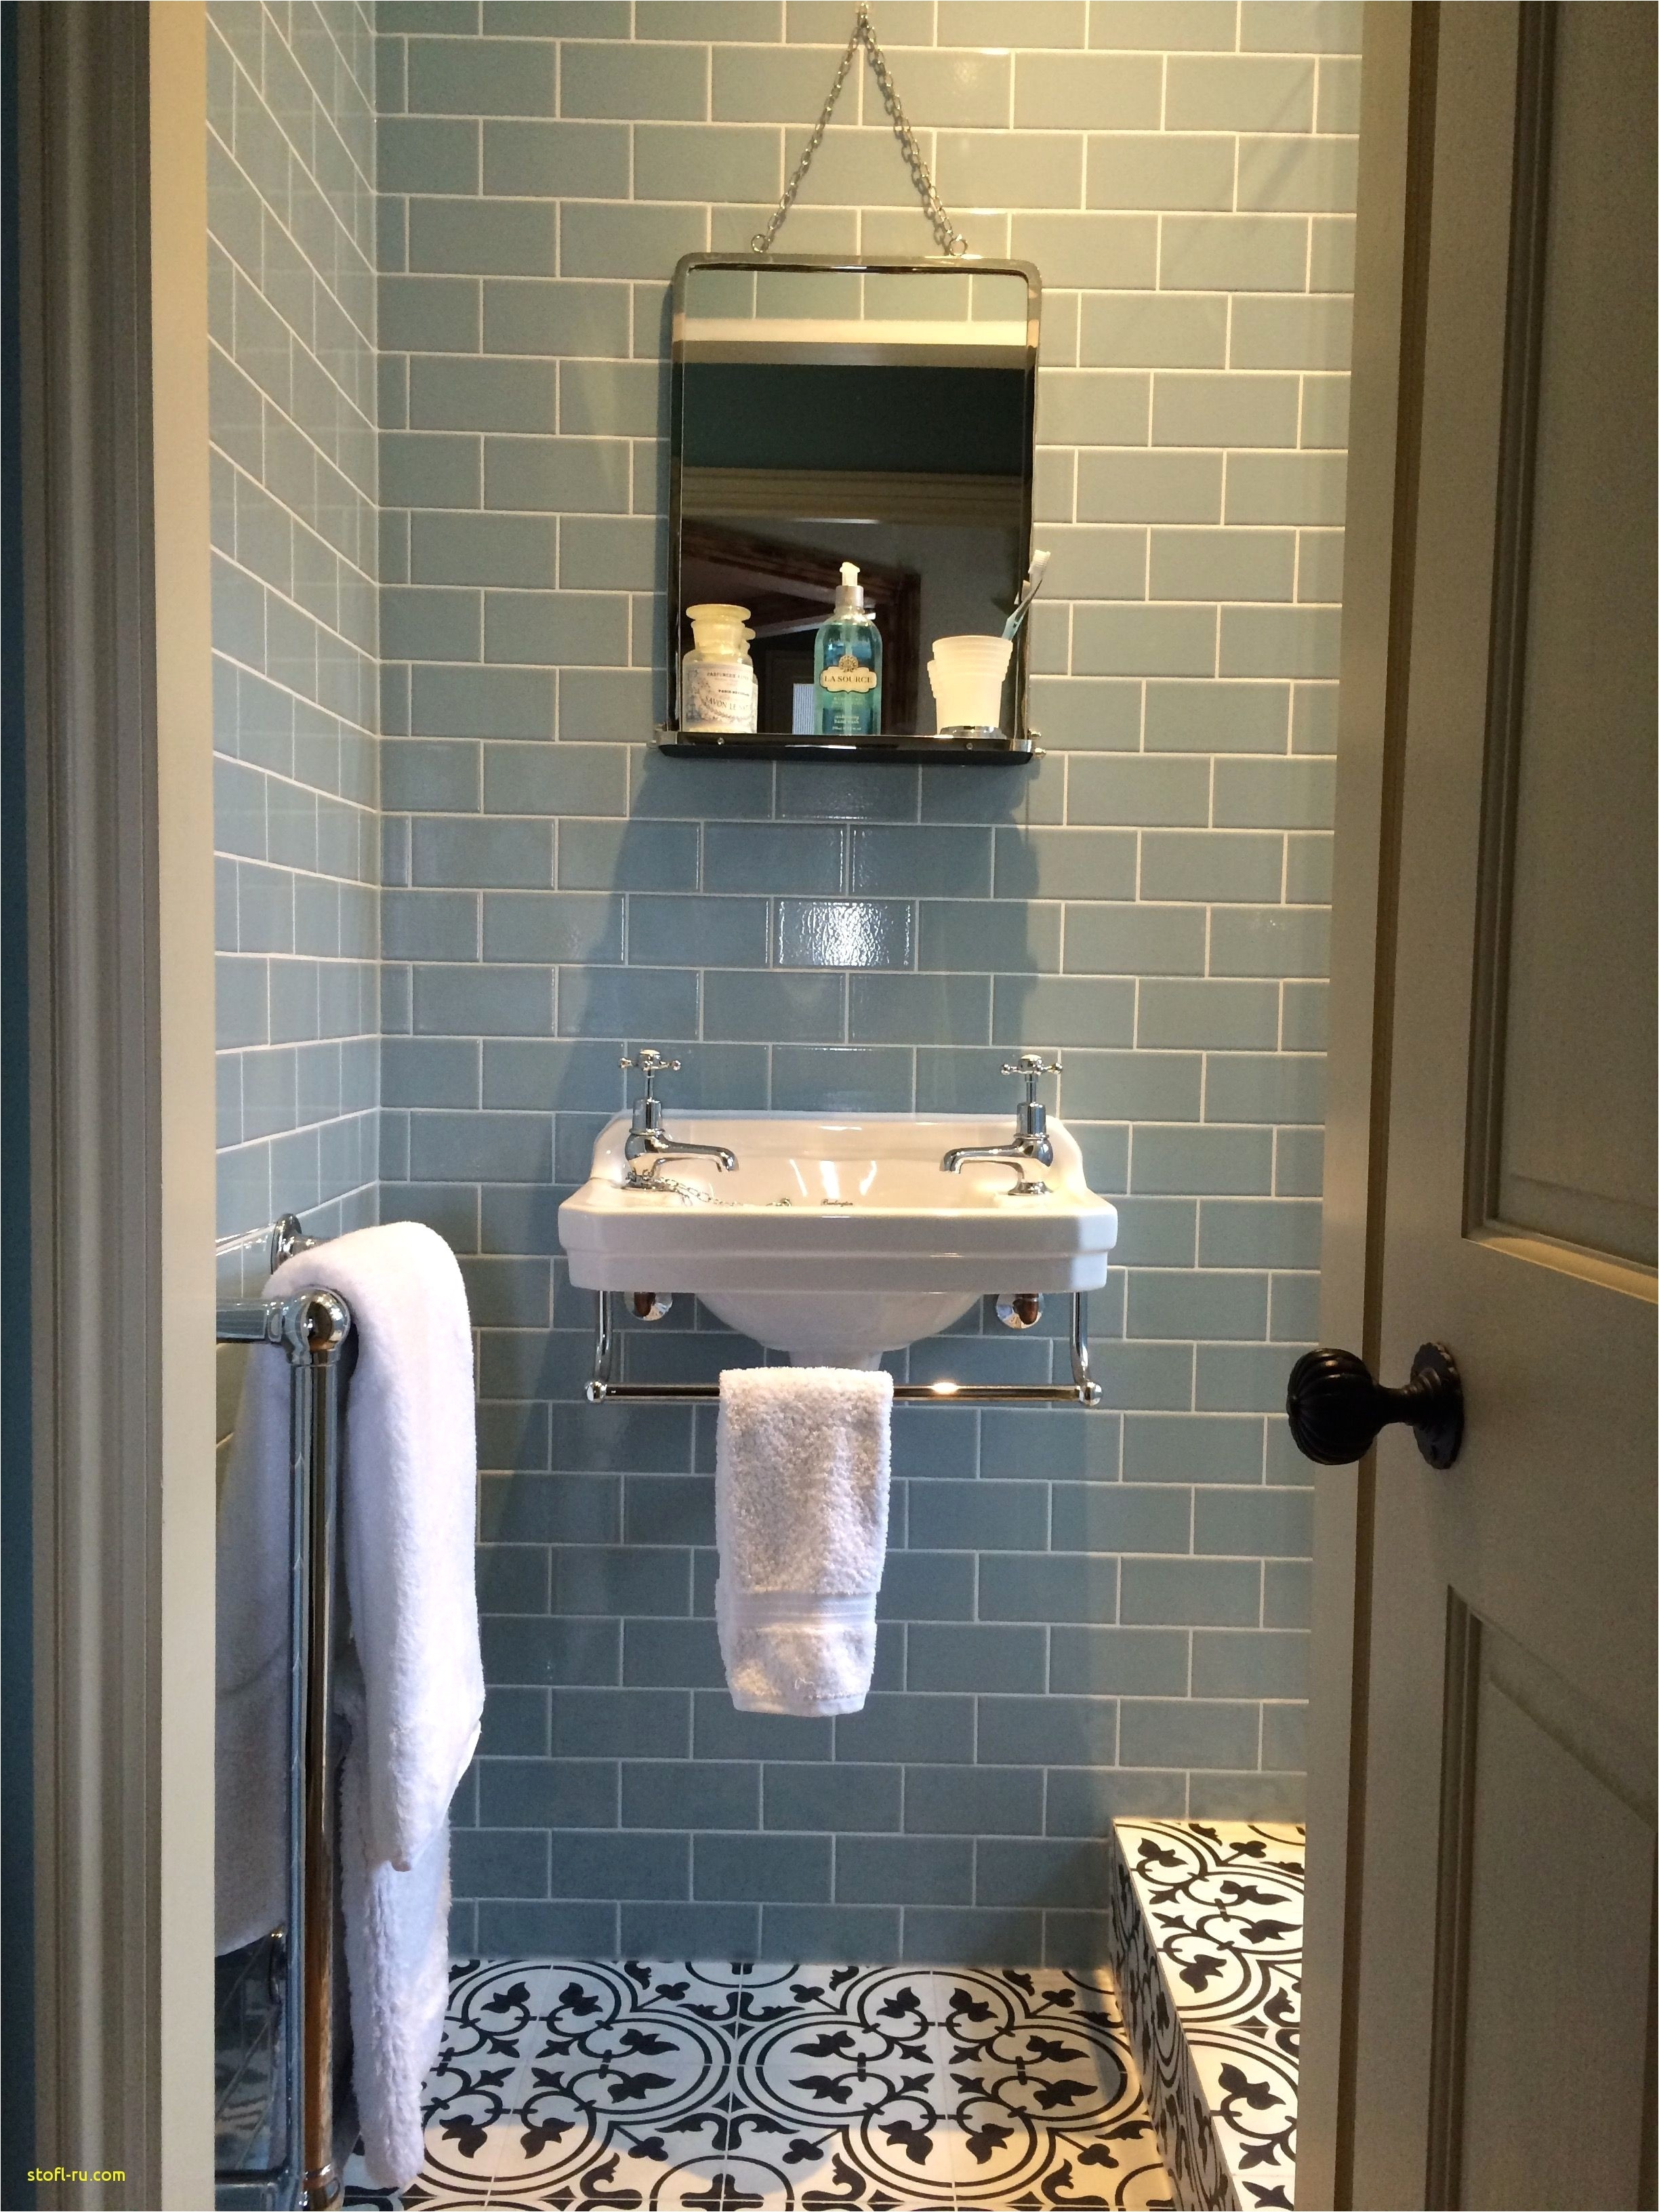 contemporary bathroom design gallery luxury fresh fresh bathroom picture ideas lovely tag toilet ideas 0d best